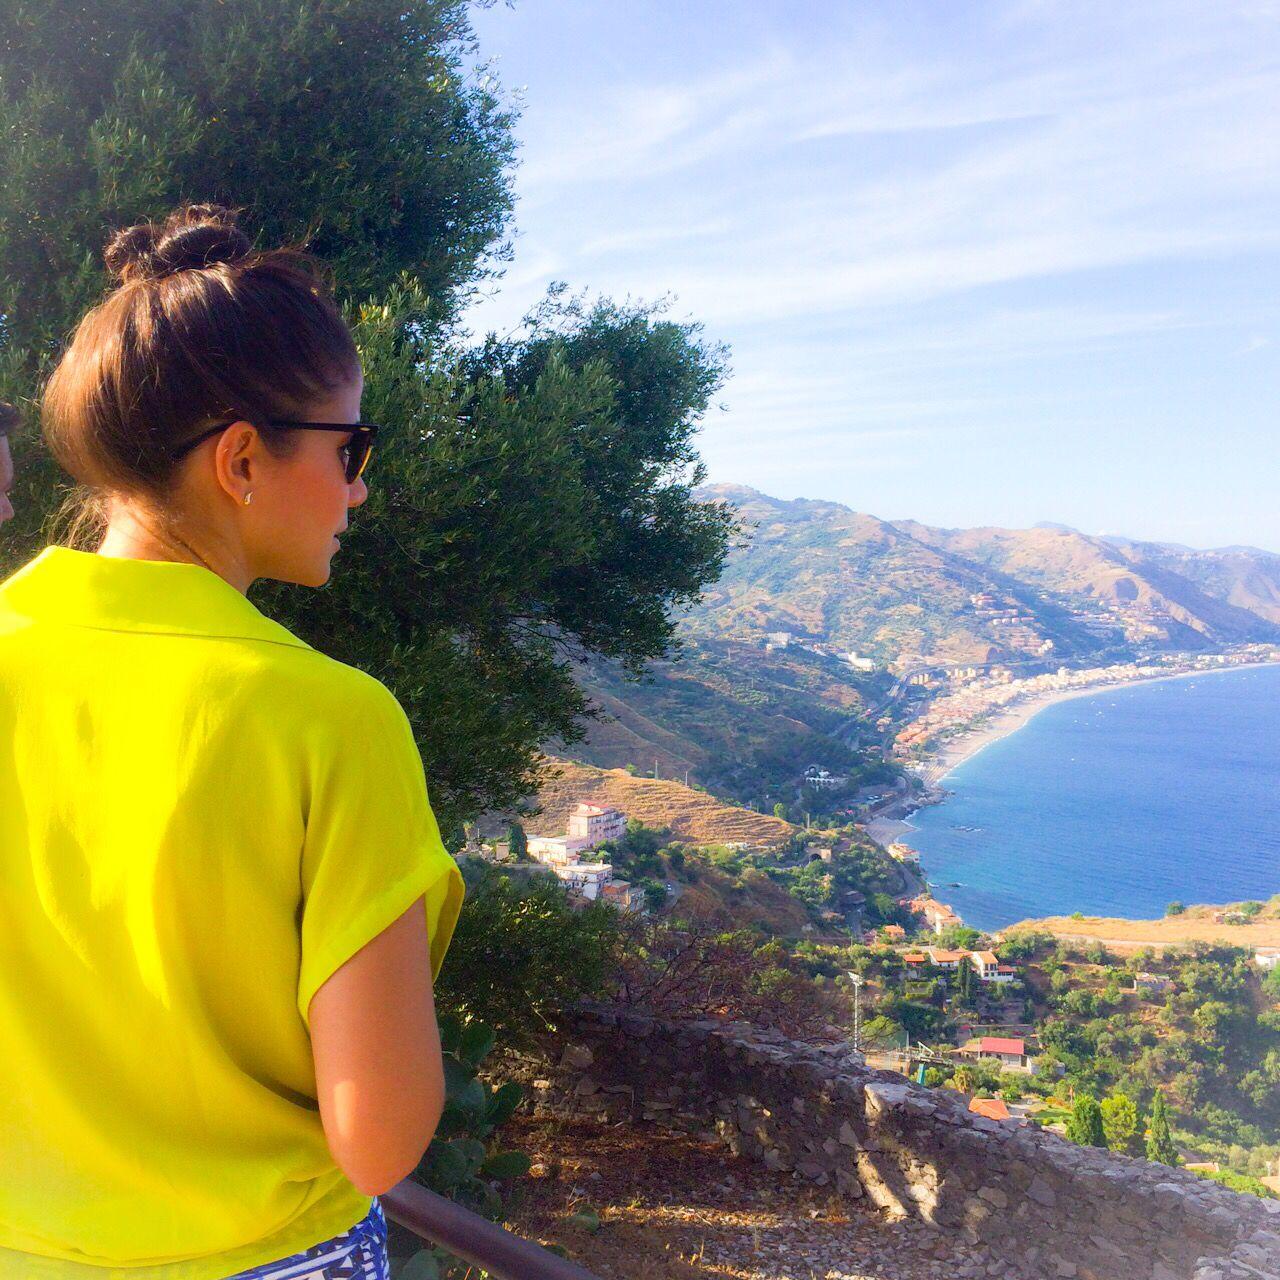 Good morning Taormina!! Who's down for a late morning walk with this epic view? #walkingandwinetasting   www.experiencetaormina.com